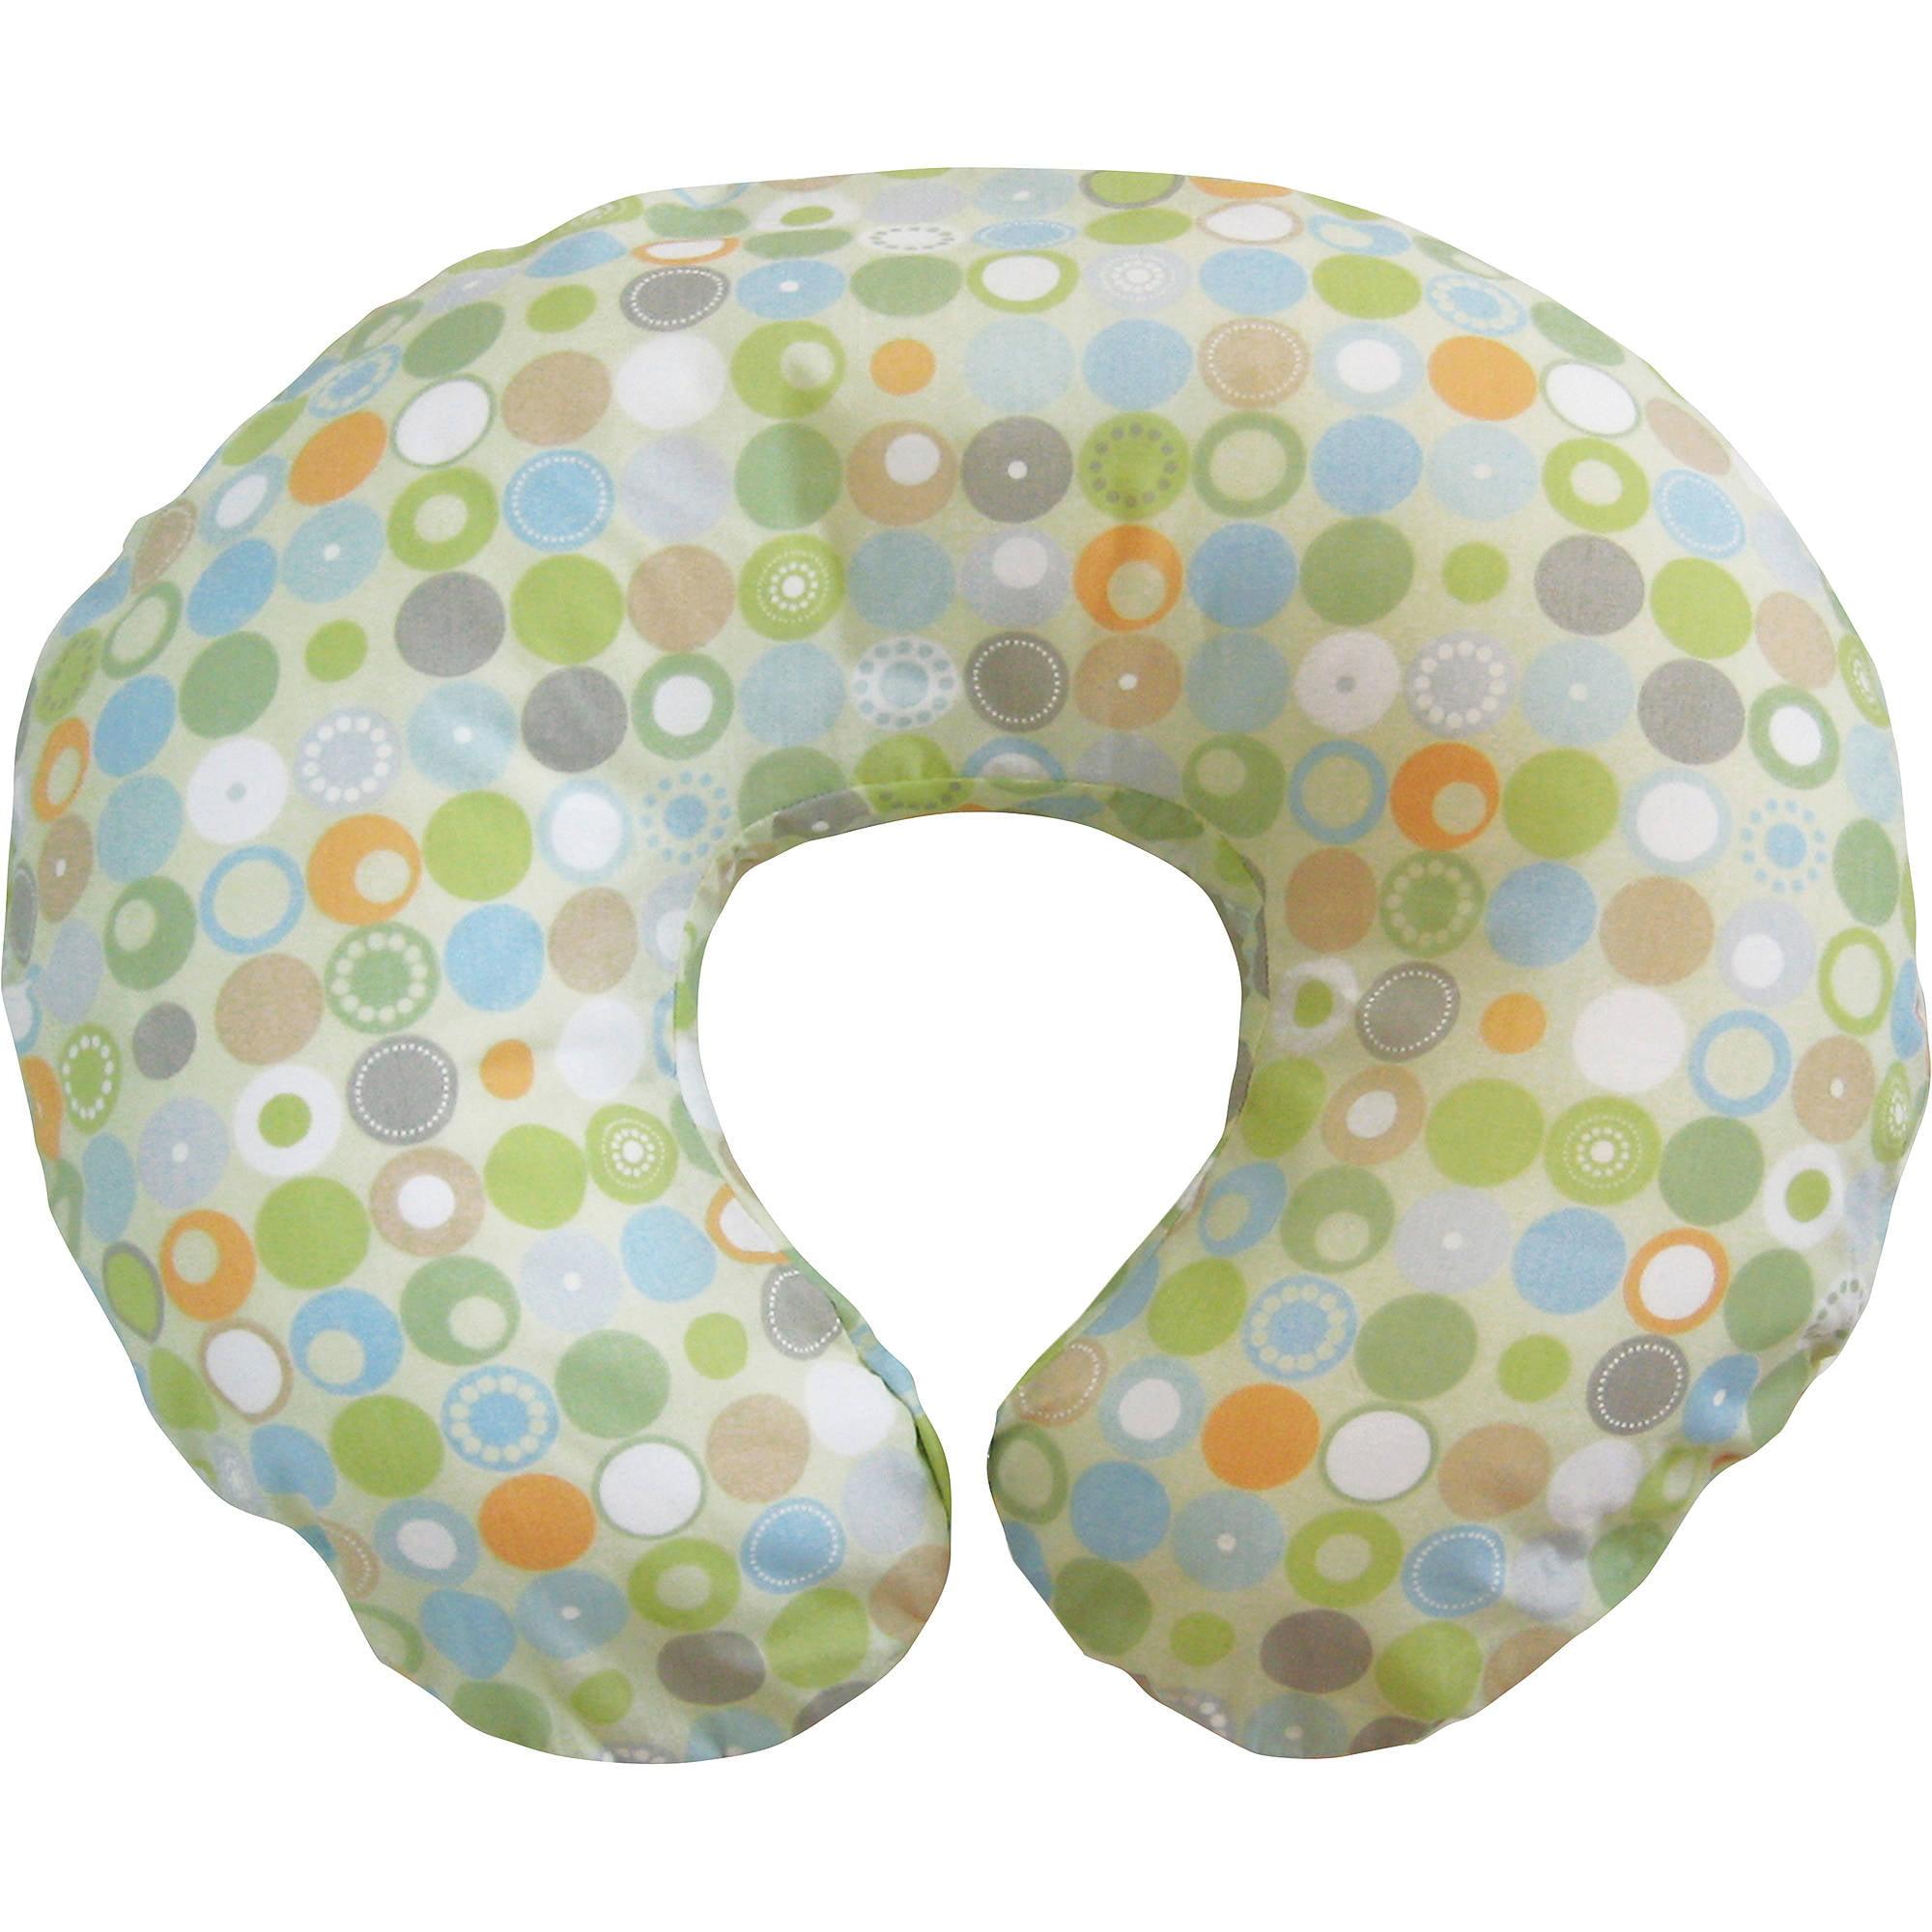 Original Boppy Nursing Pillow and Positioner - Lots o Dots